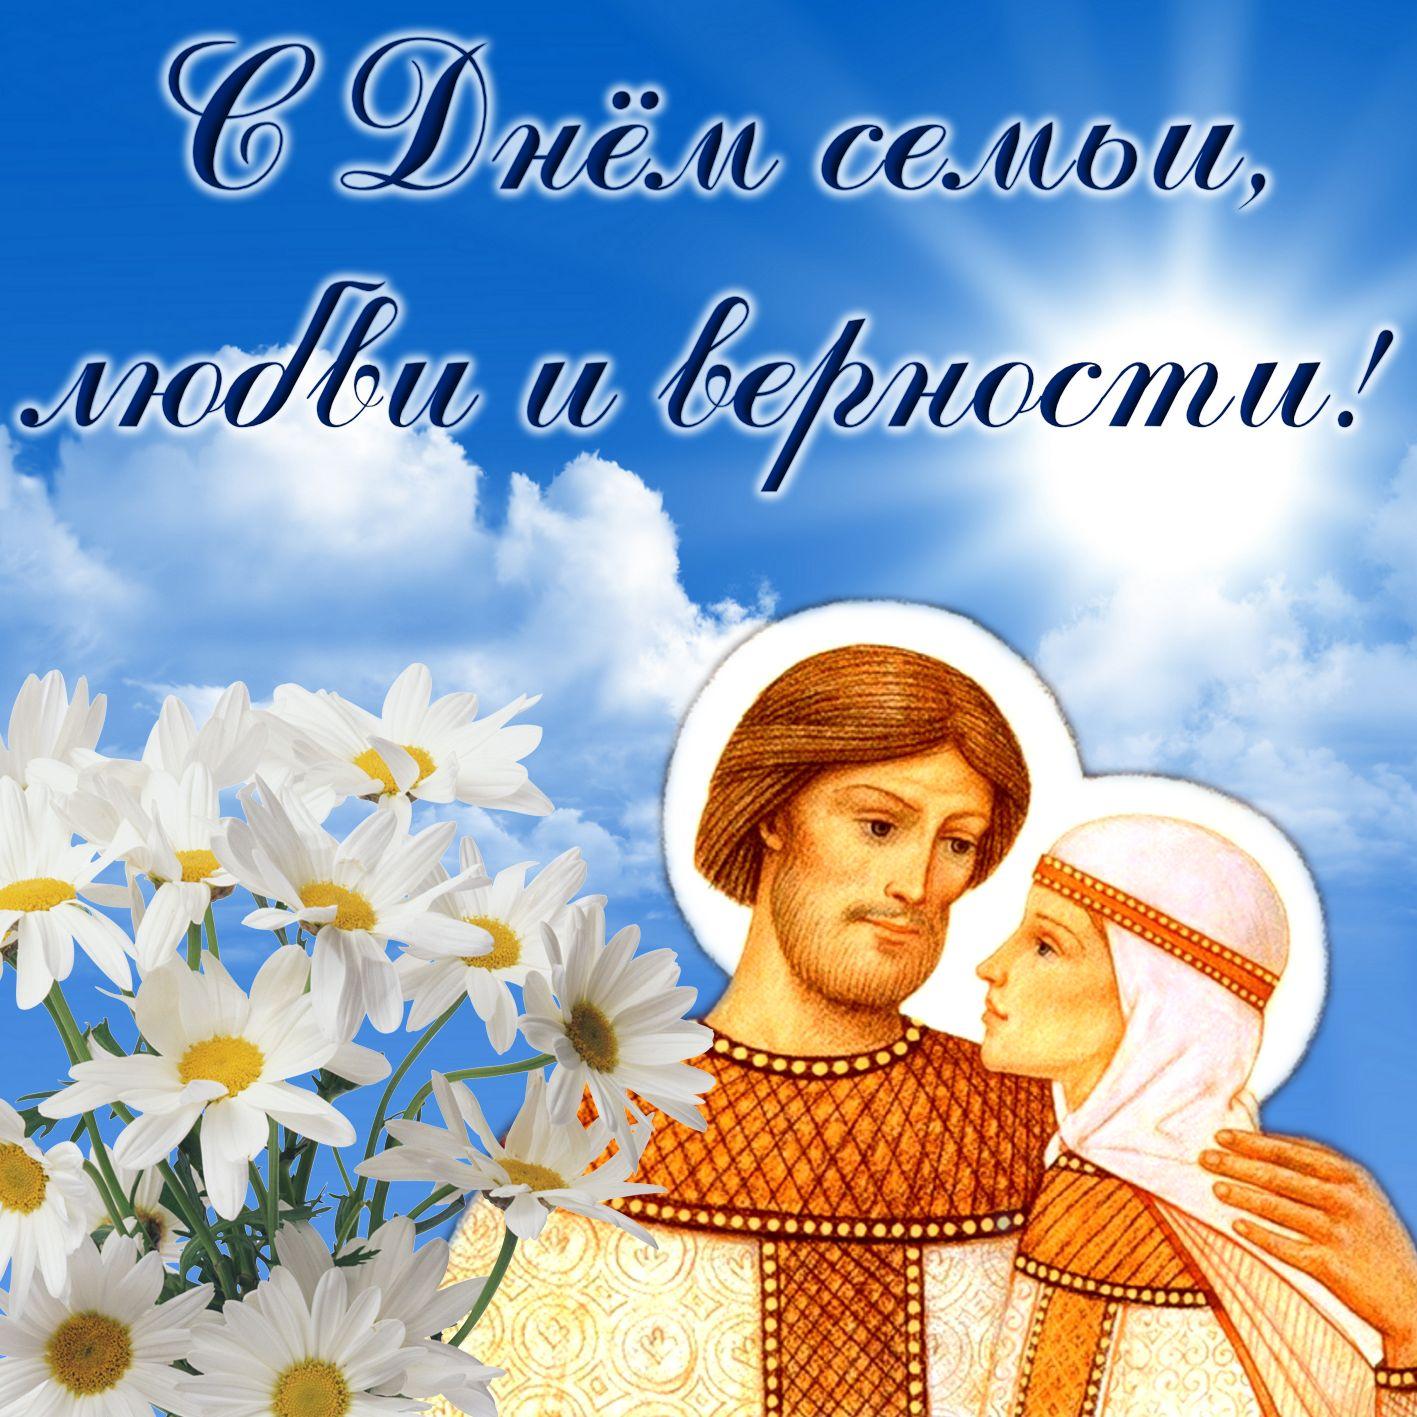 Святого валентина, картинки на праздник семьи любви и верности